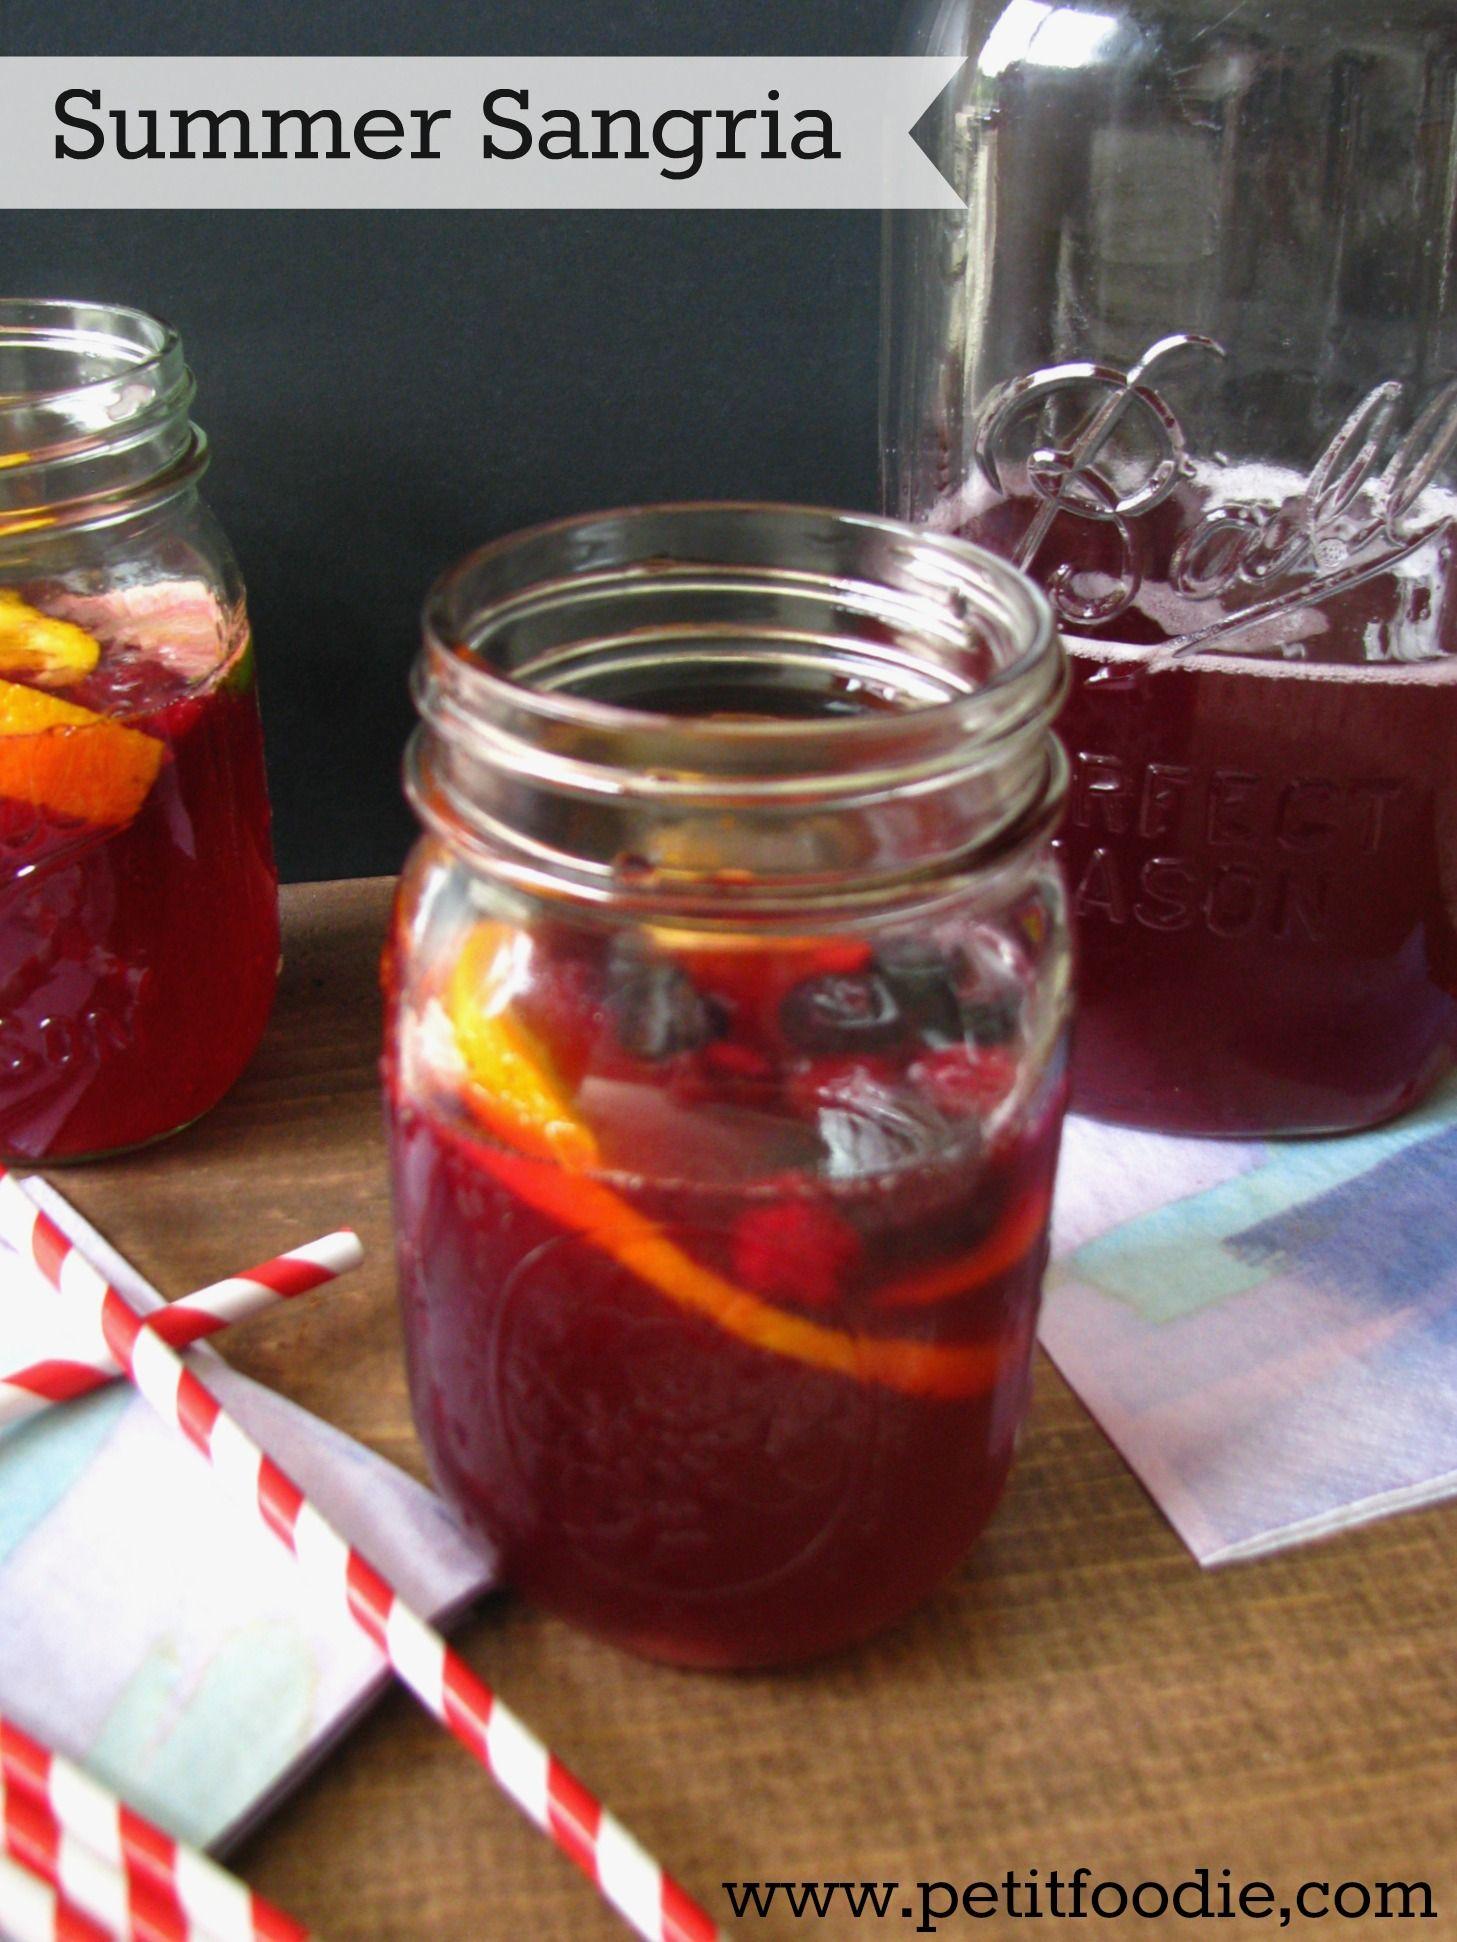 Summer Sangria Www Petitfoodie Com Jpg 1 457 1 942 Pixels Yummy Drinks Sangria Recipes Summer Sangria